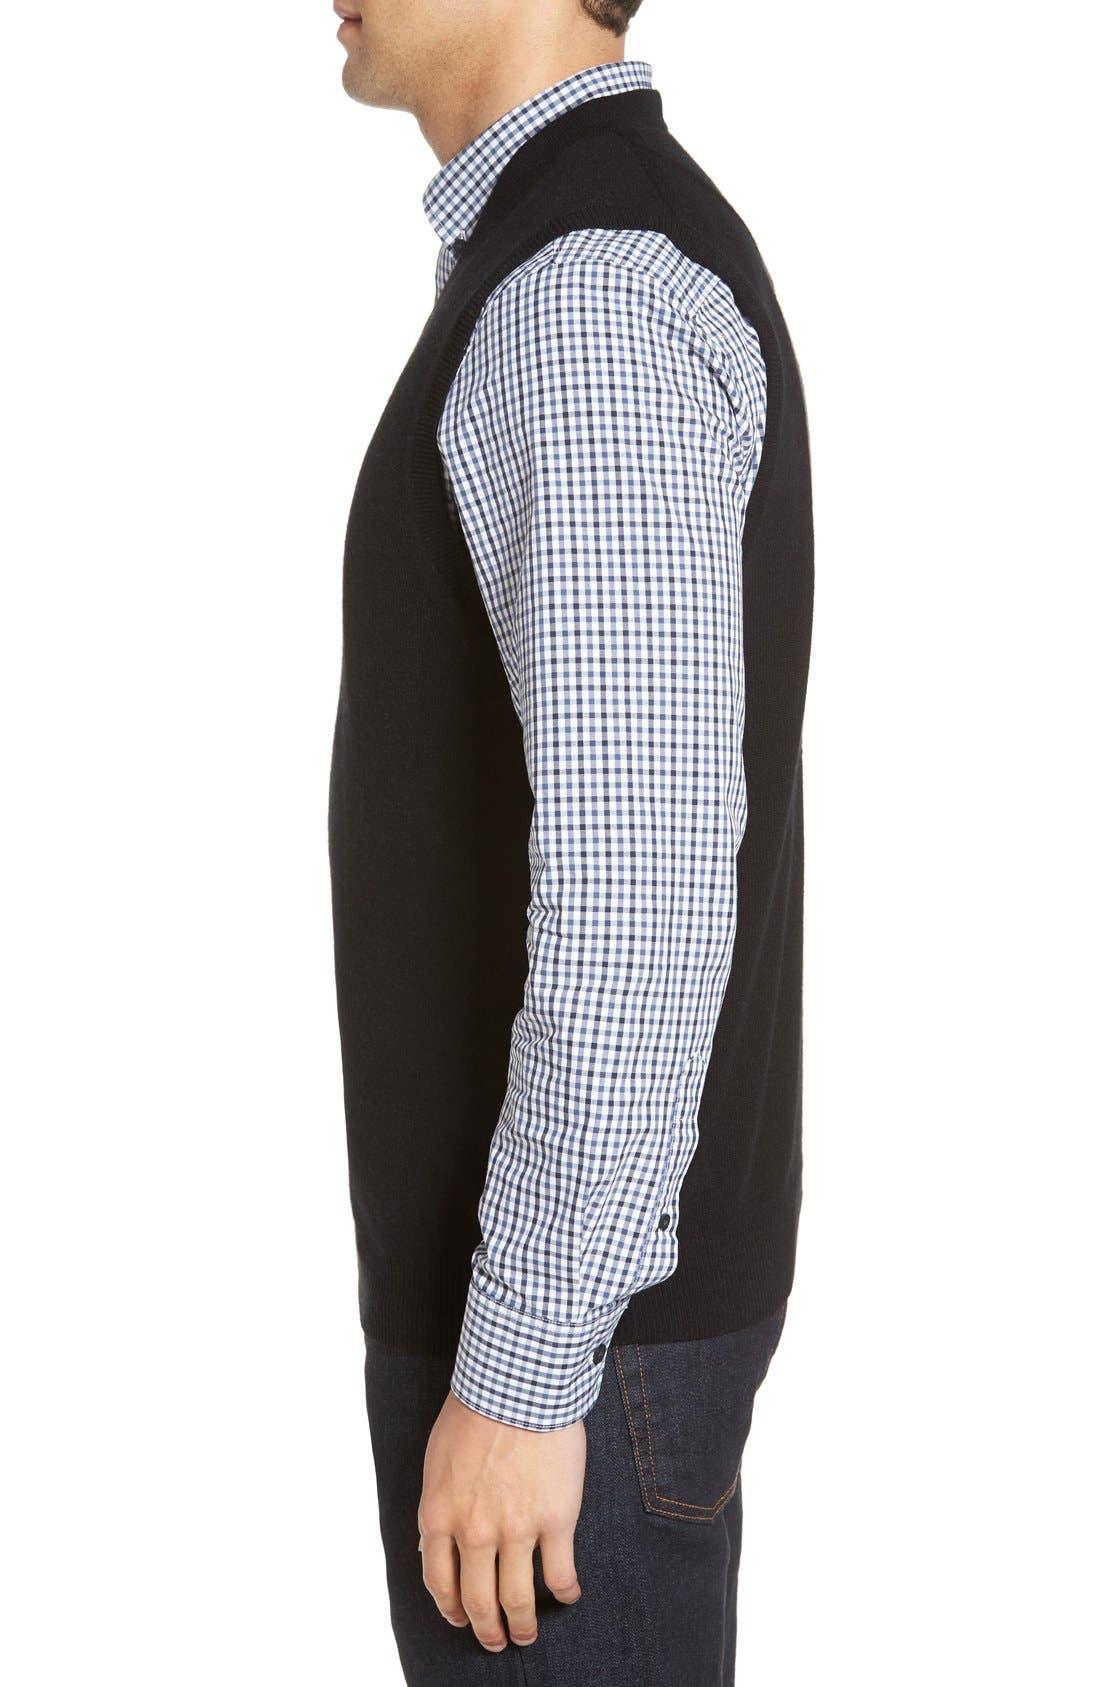 Cashmere V-Neck Sweater Vest,                             Alternate thumbnail 10, color,                             BLACK CAVIAR